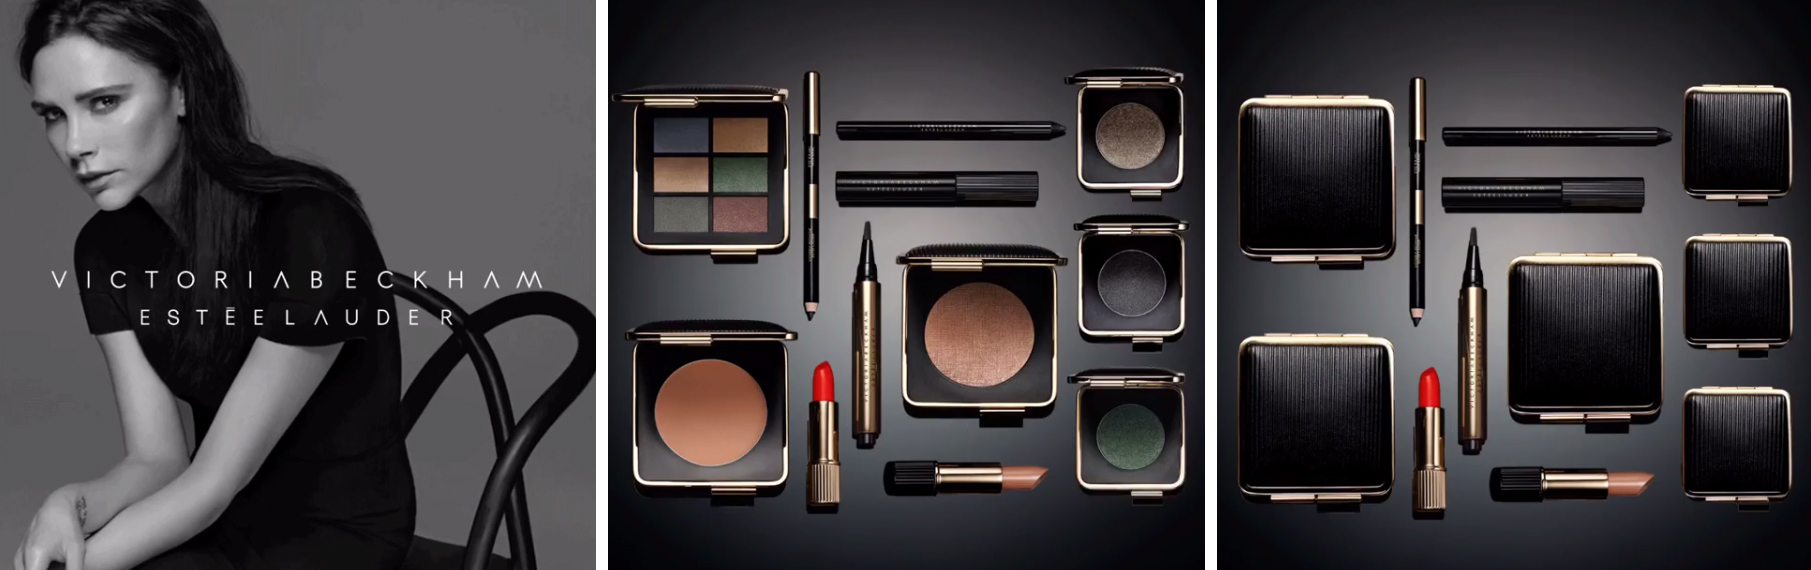 Victoria Beckham for Estee Lauder makeup collection